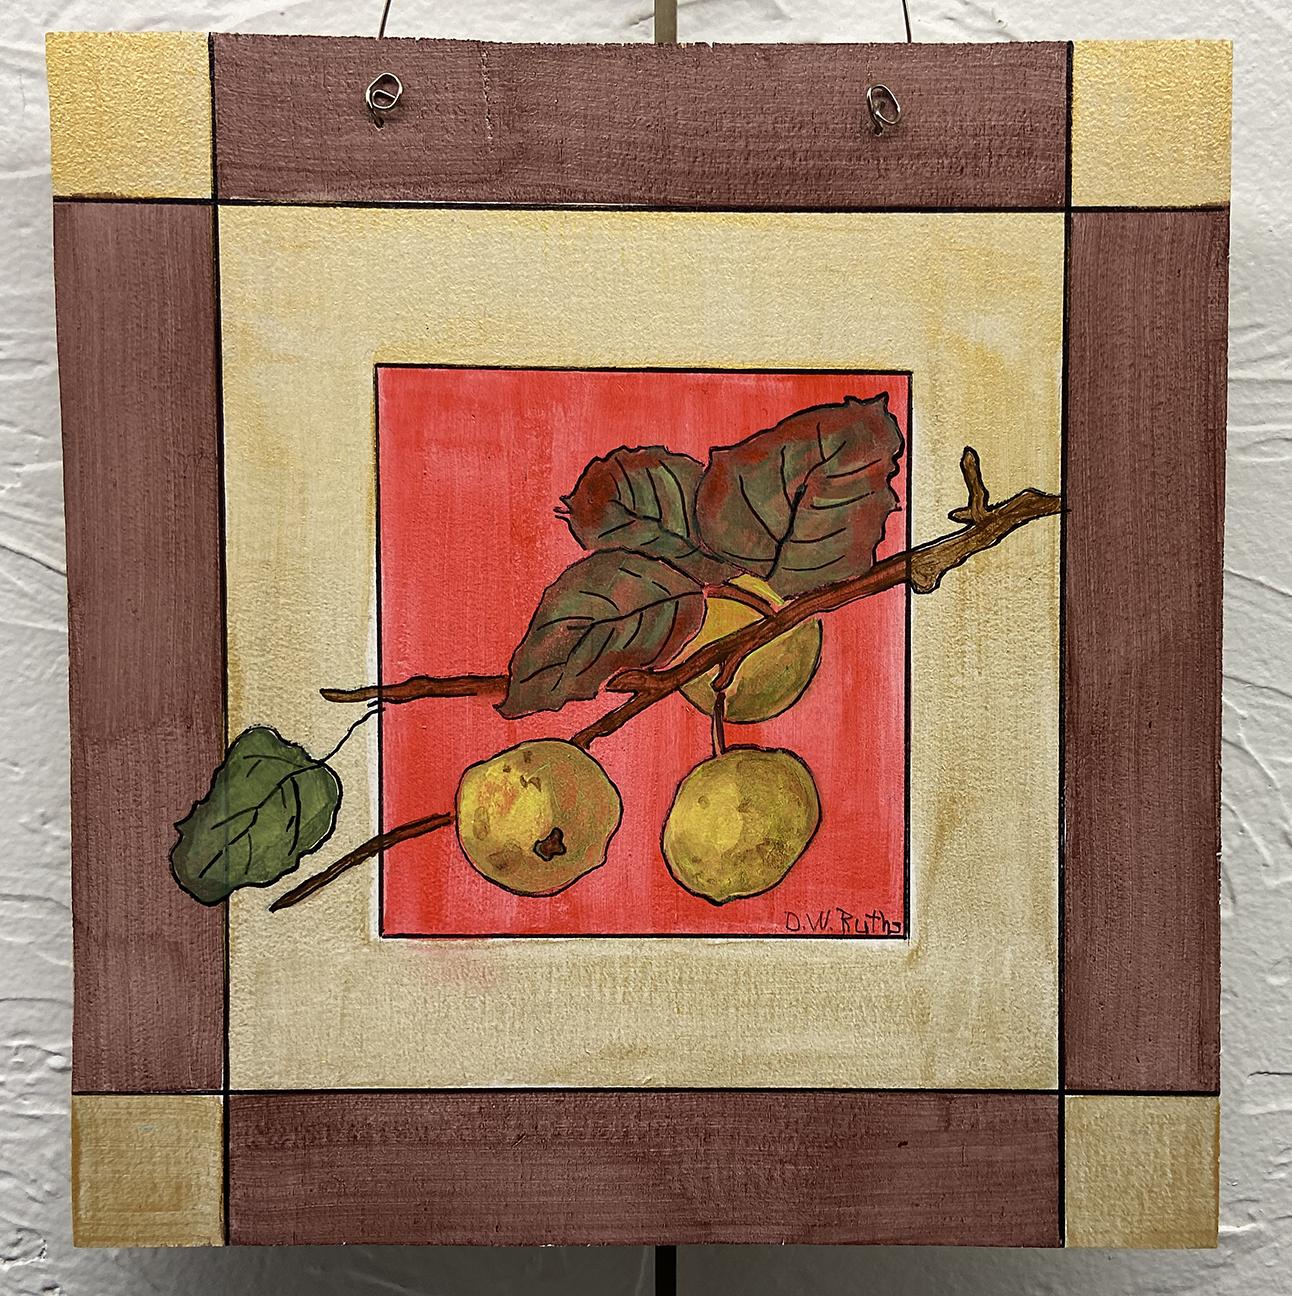 #9 Berries, Deb Ruths, Acrylic on Wood (8 x 8), $10.00 suggested minimum bid  (31 meals)